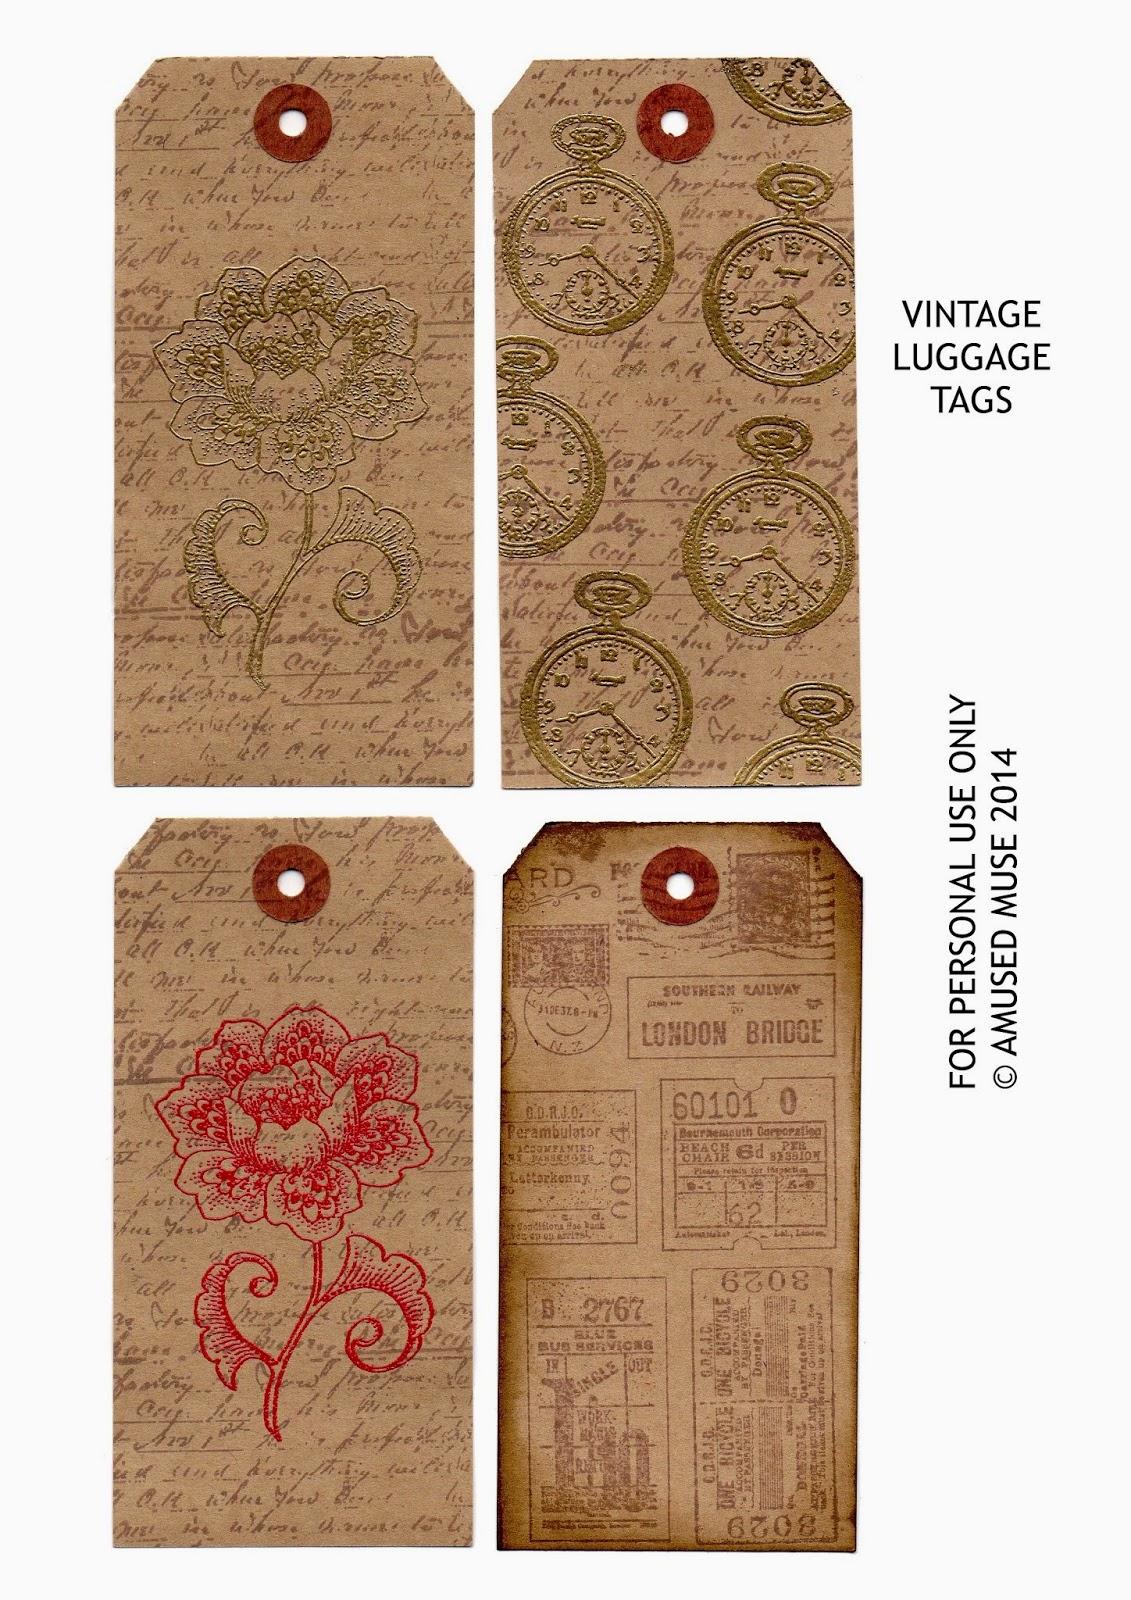 5 best images of vintage luggage tags printable vintage luggage tags template free printable. Black Bedroom Furniture Sets. Home Design Ideas